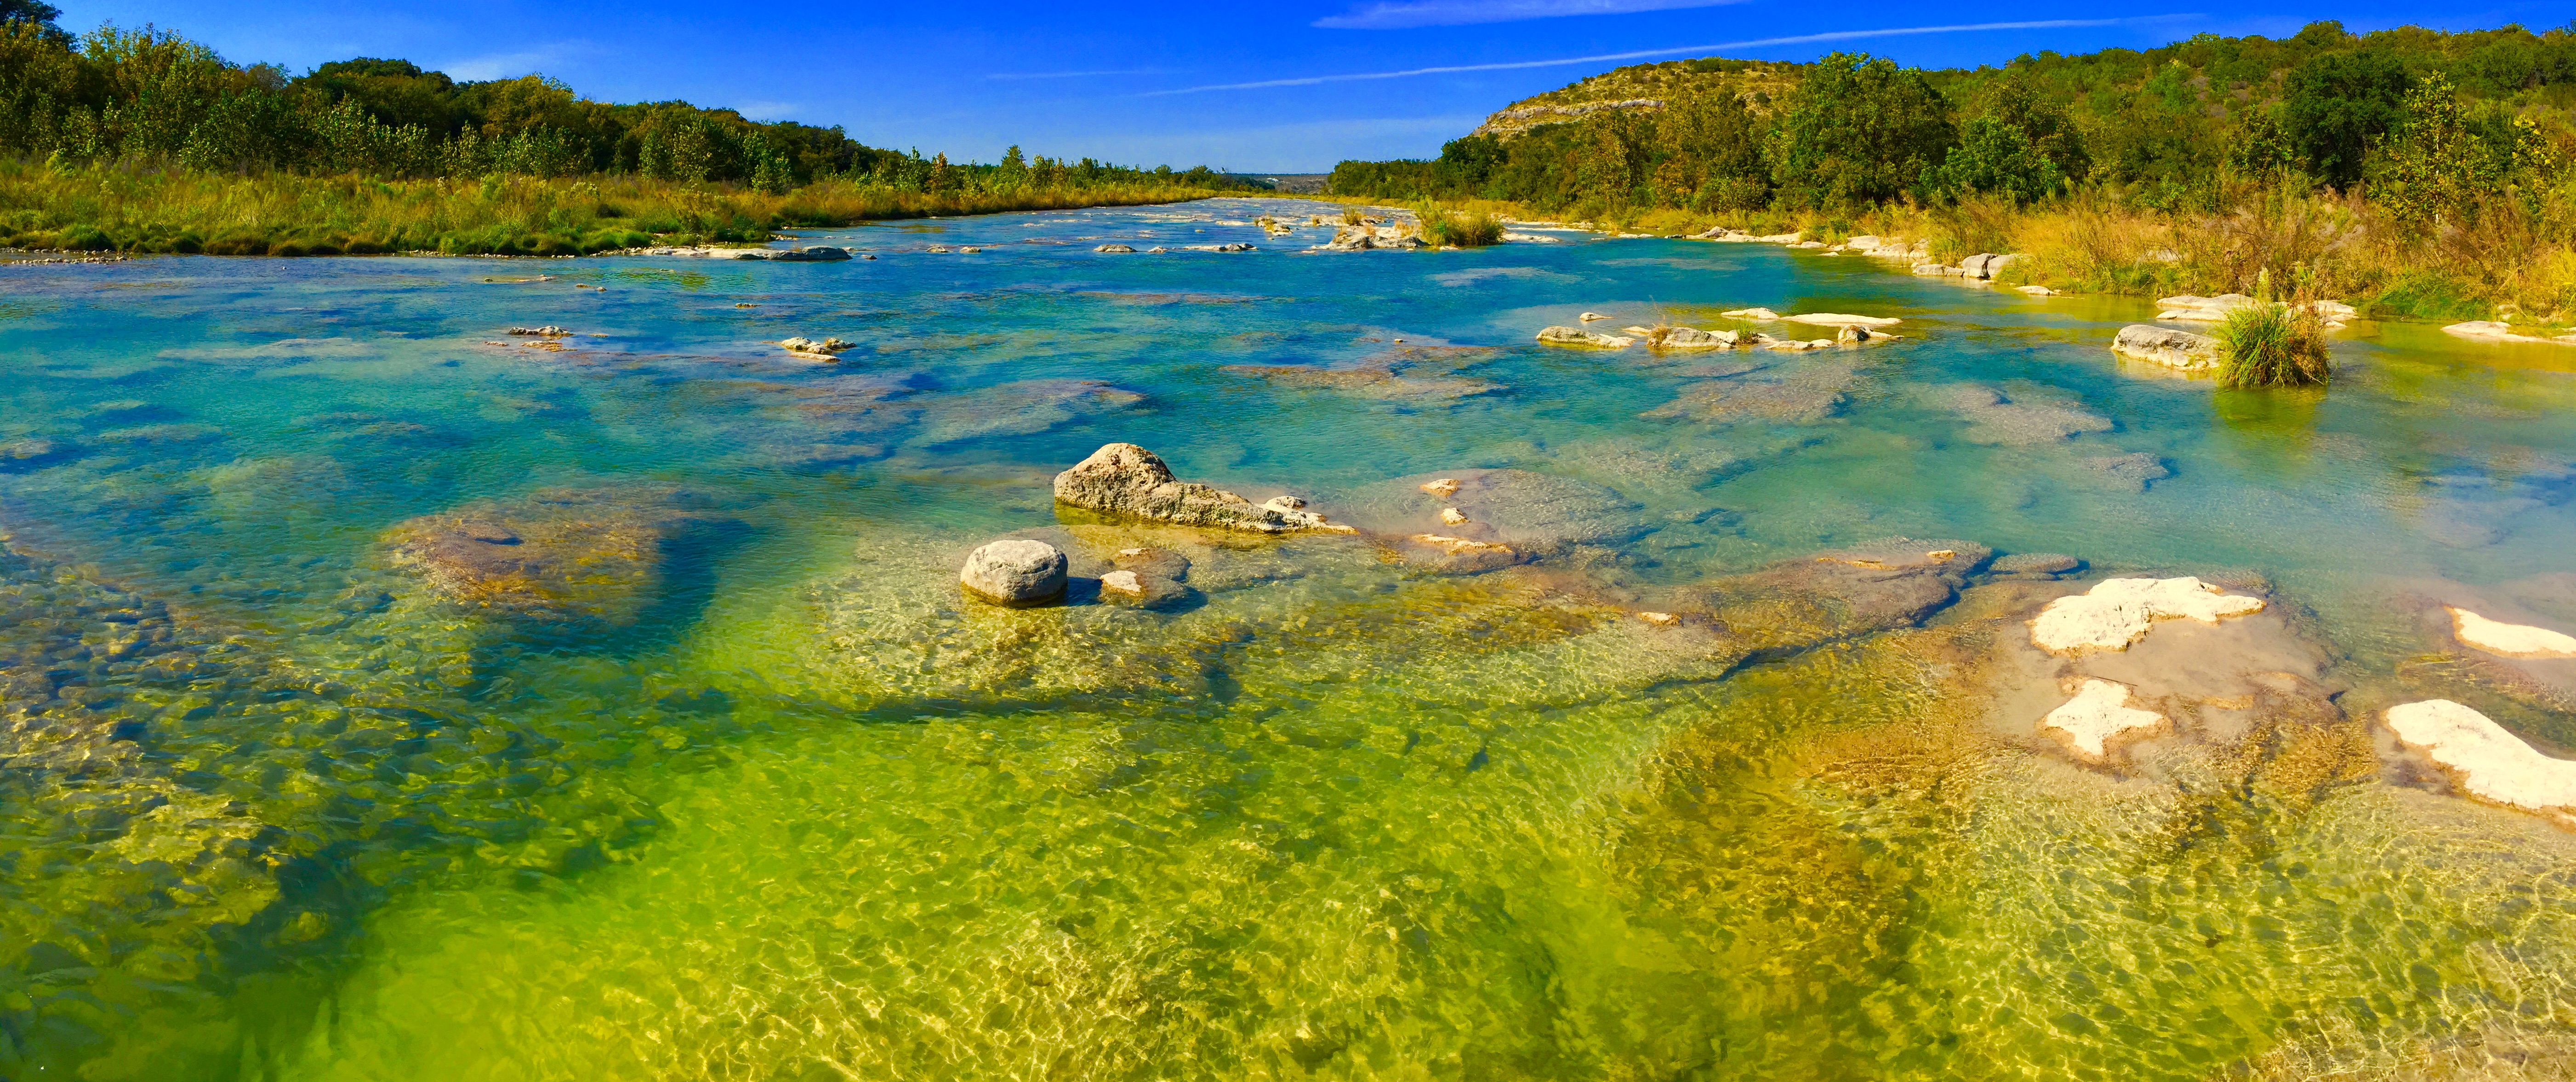 Llano - Batcreek River - 1